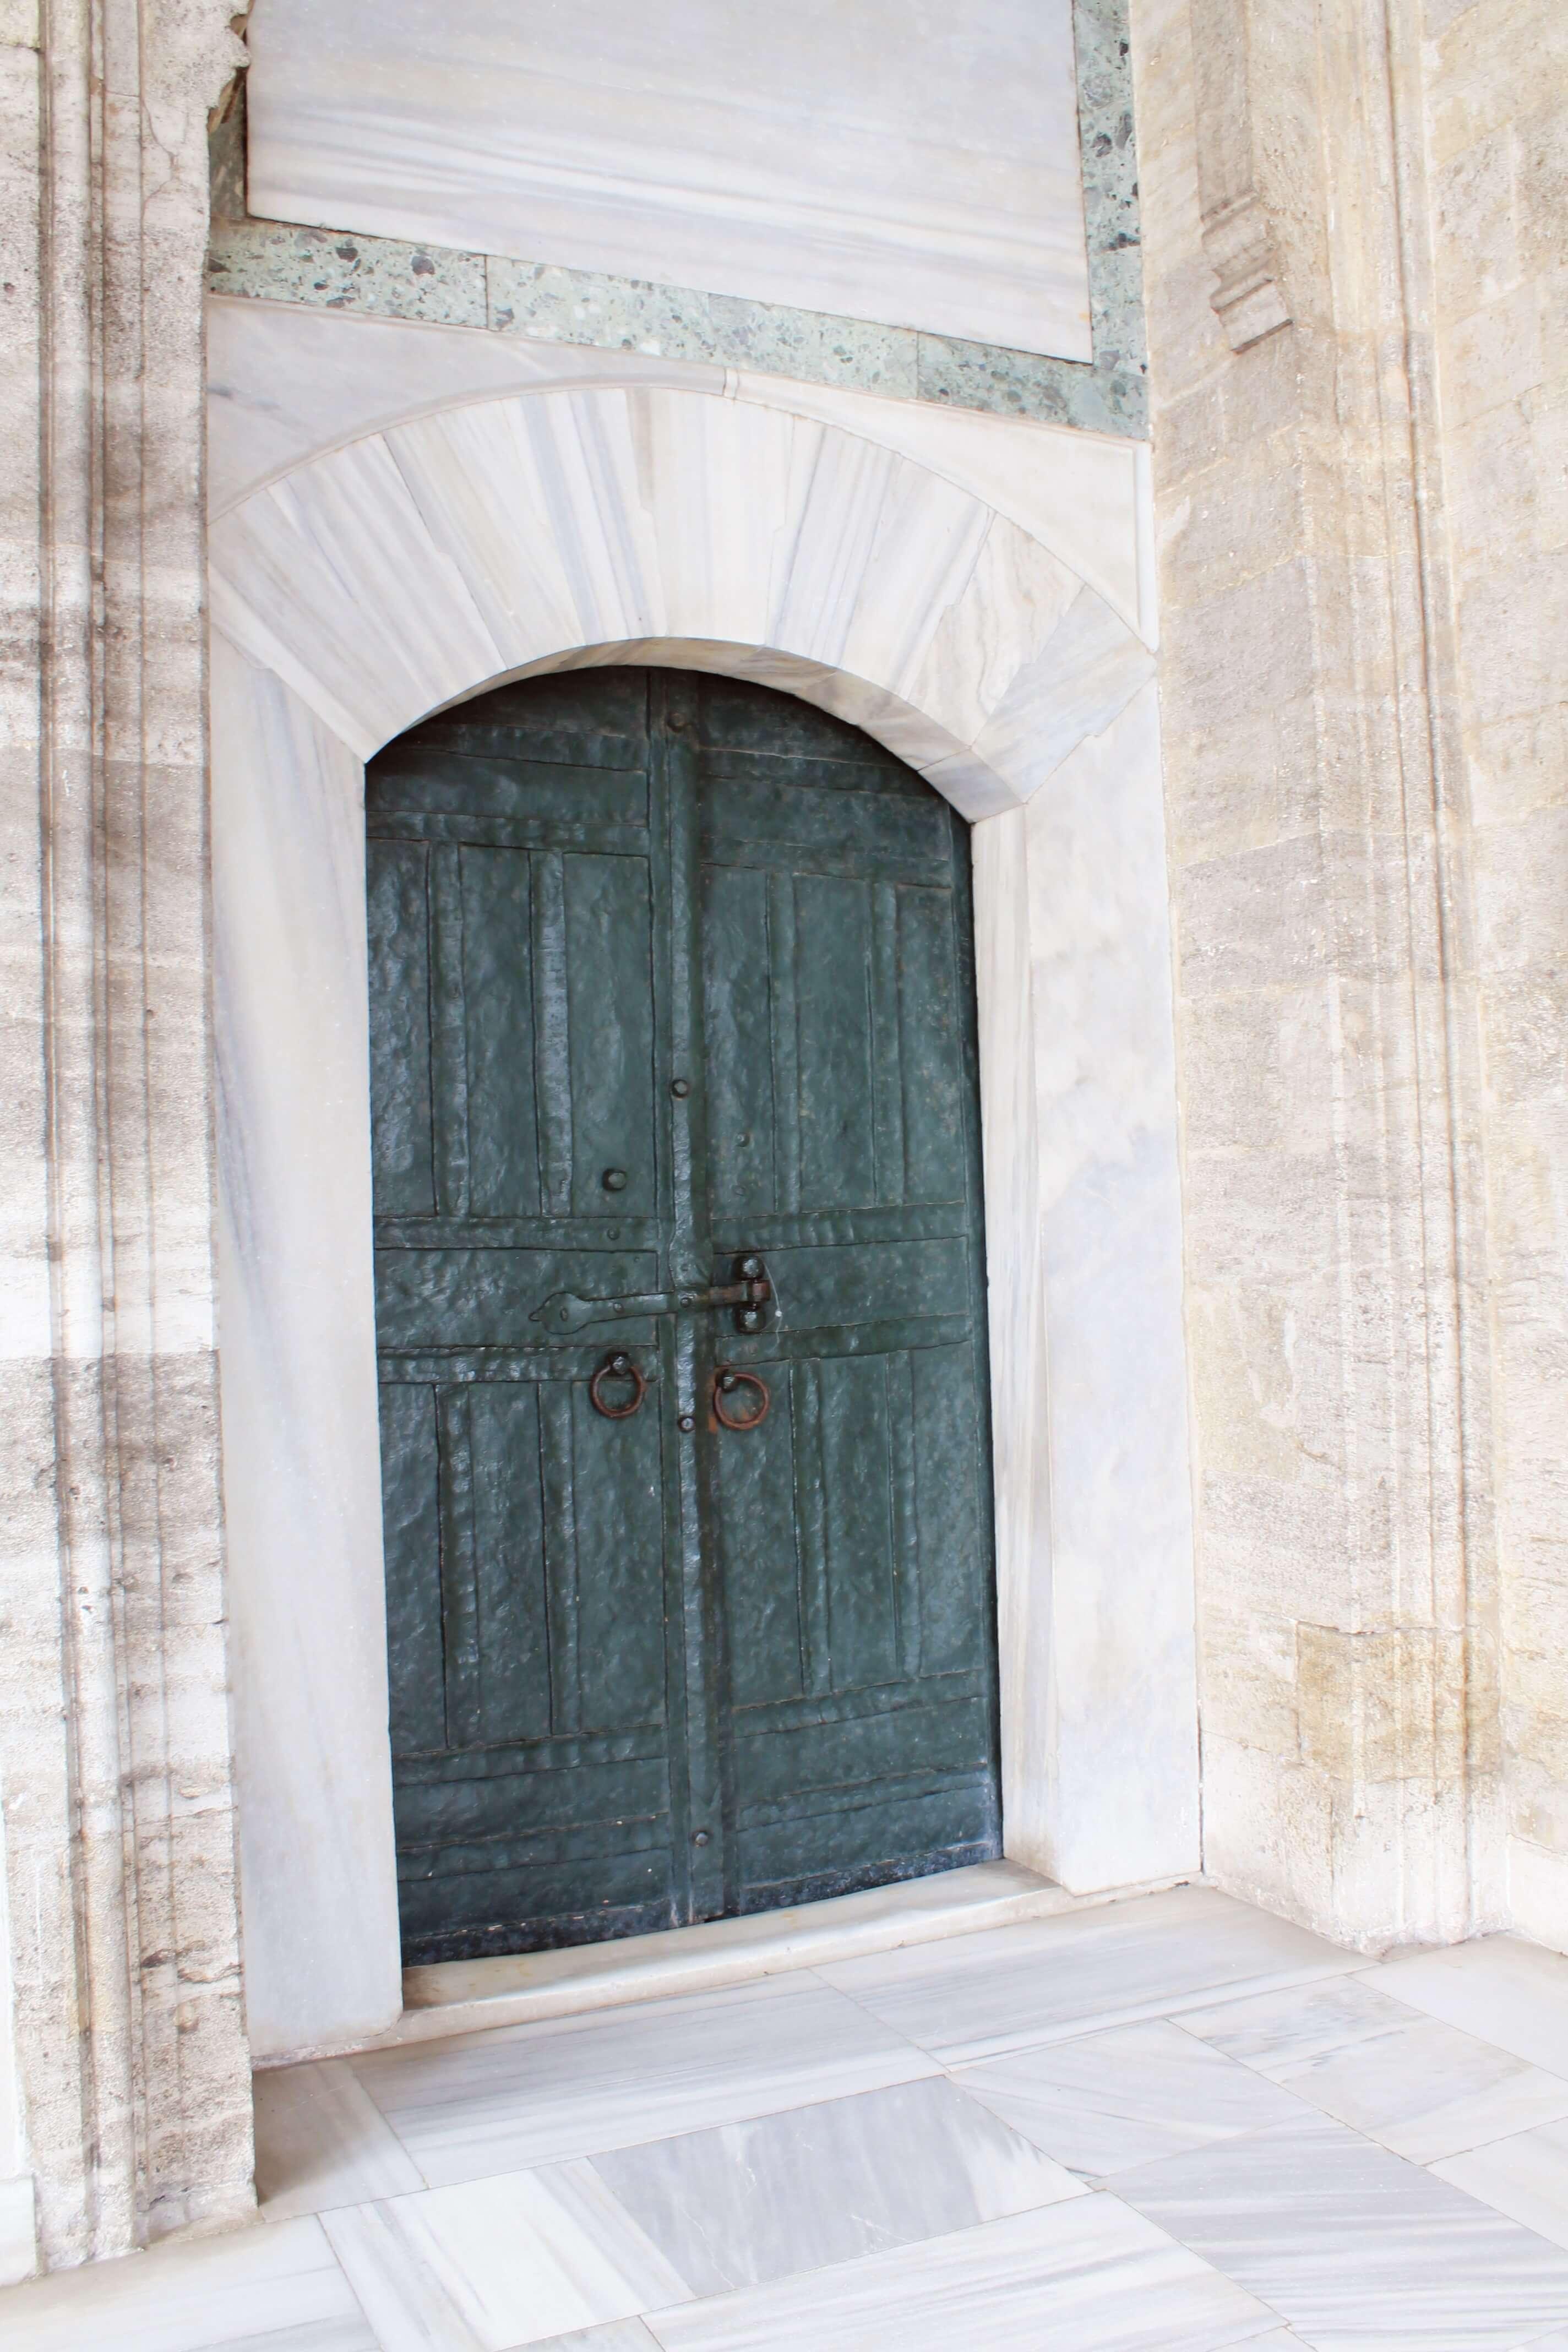 Circumcision Chamber_exterior_bronze door_Topkapi 4th Courtyard